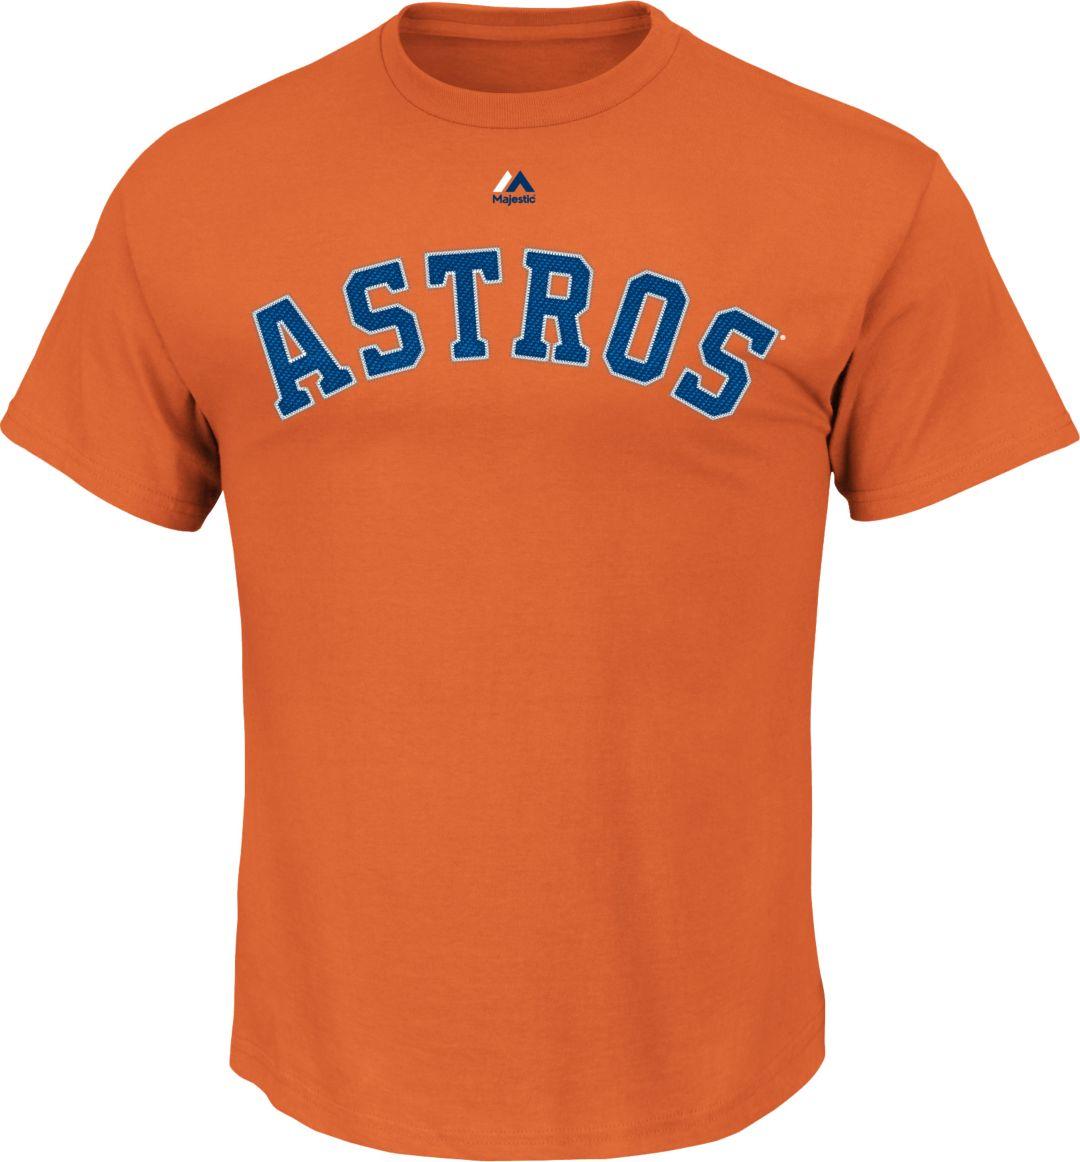 new arrival 1d22e 13278 Majestic Men's Houston Astros Alex Bregman #2 Orange T-Shirt